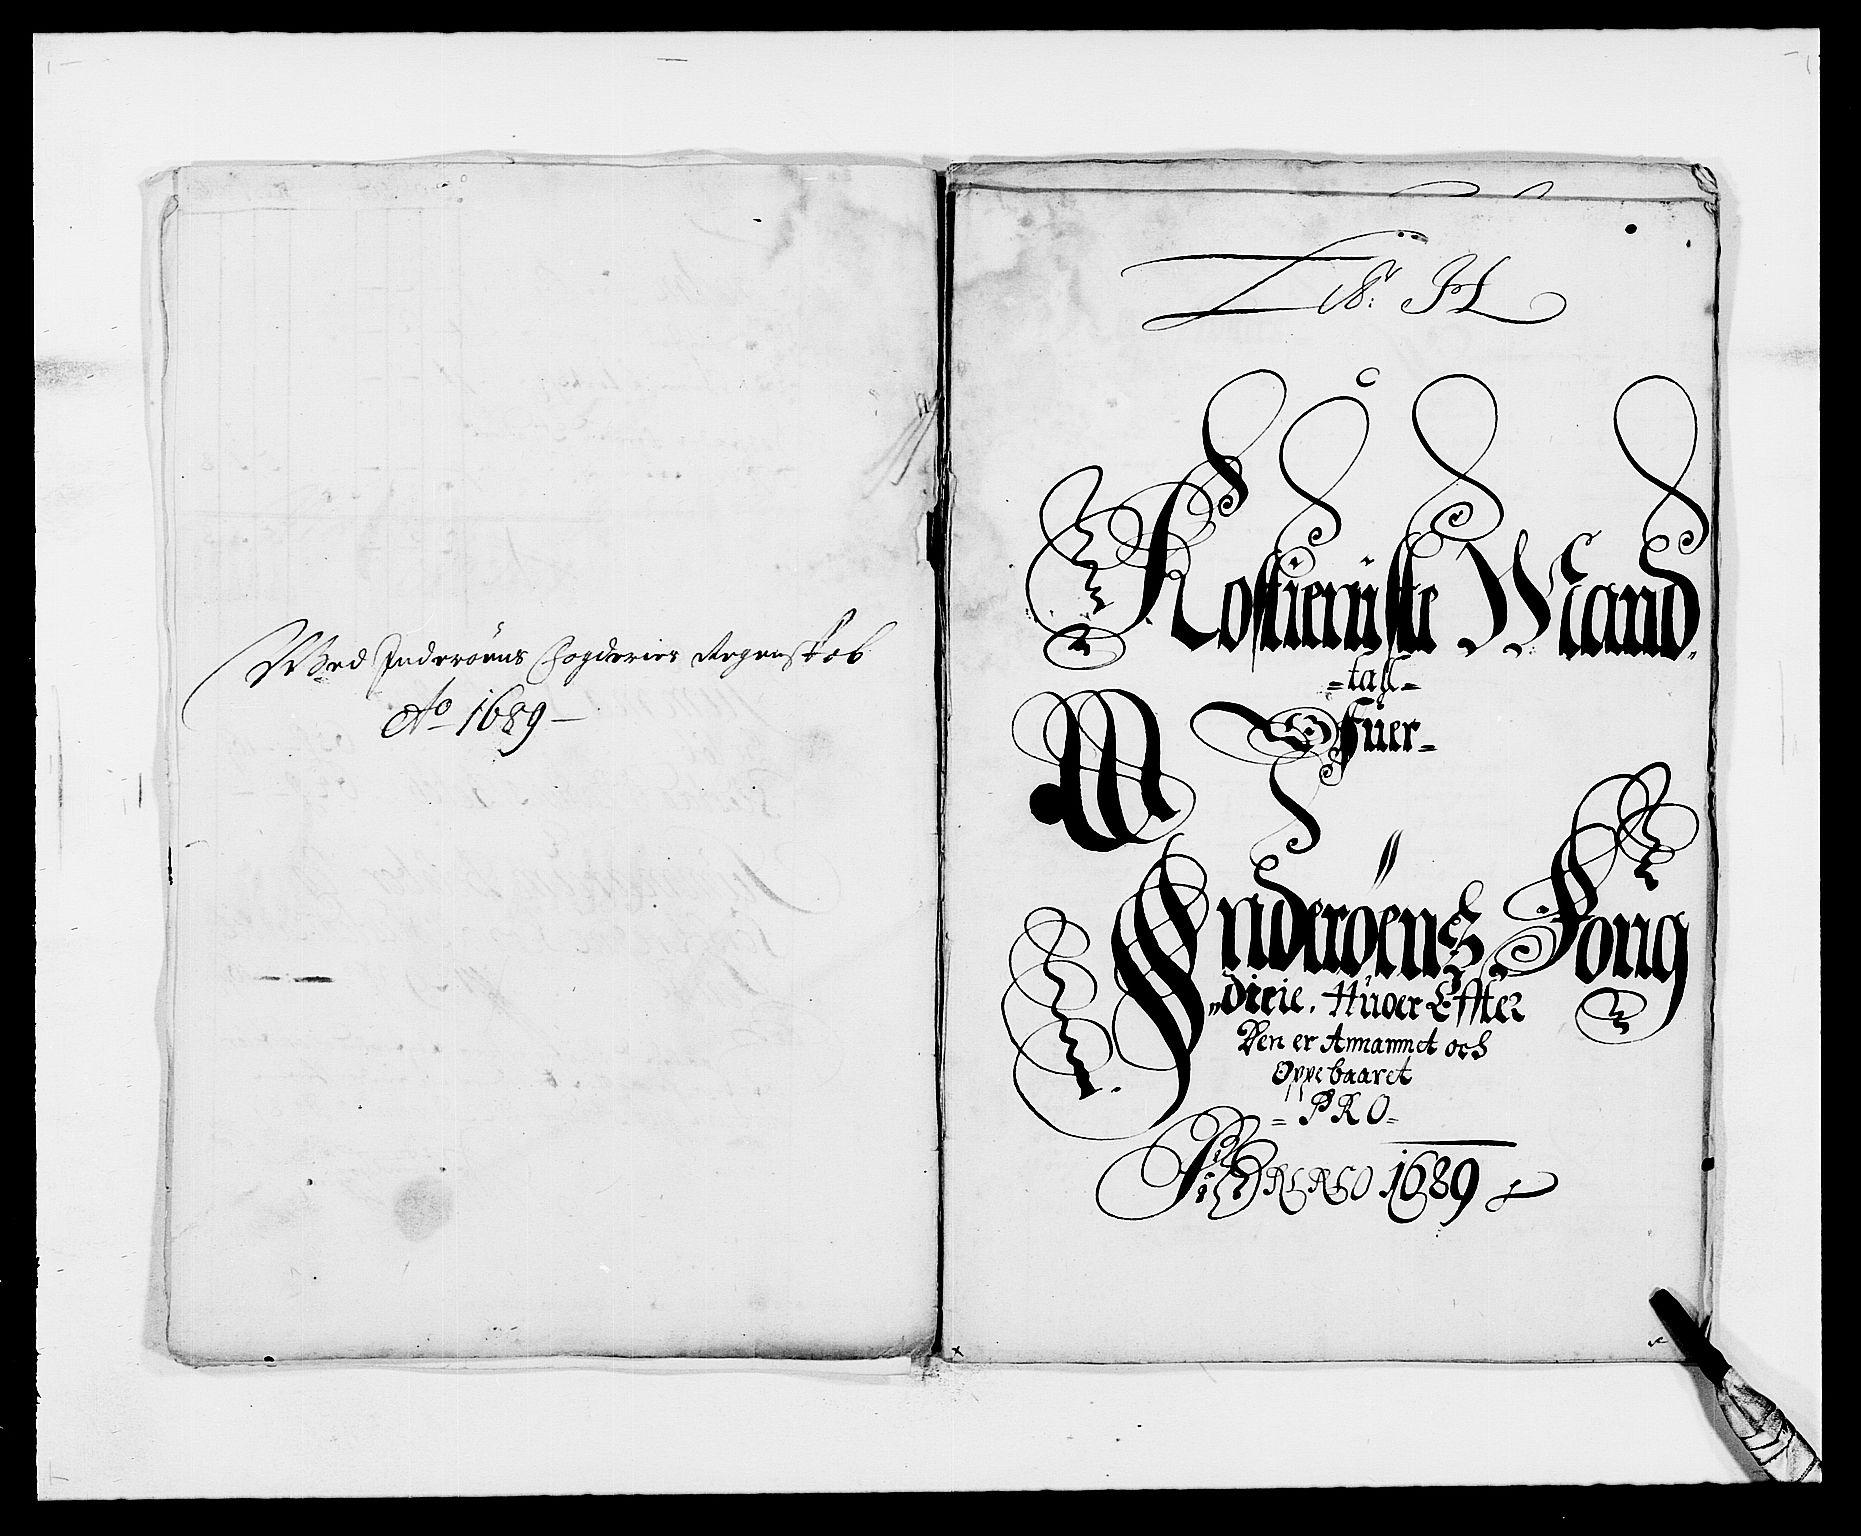 RA, Rentekammeret inntil 1814, Reviderte regnskaper, Fogderegnskap, R63/L4306: Fogderegnskap Inderøy, 1687-1689, s. 438